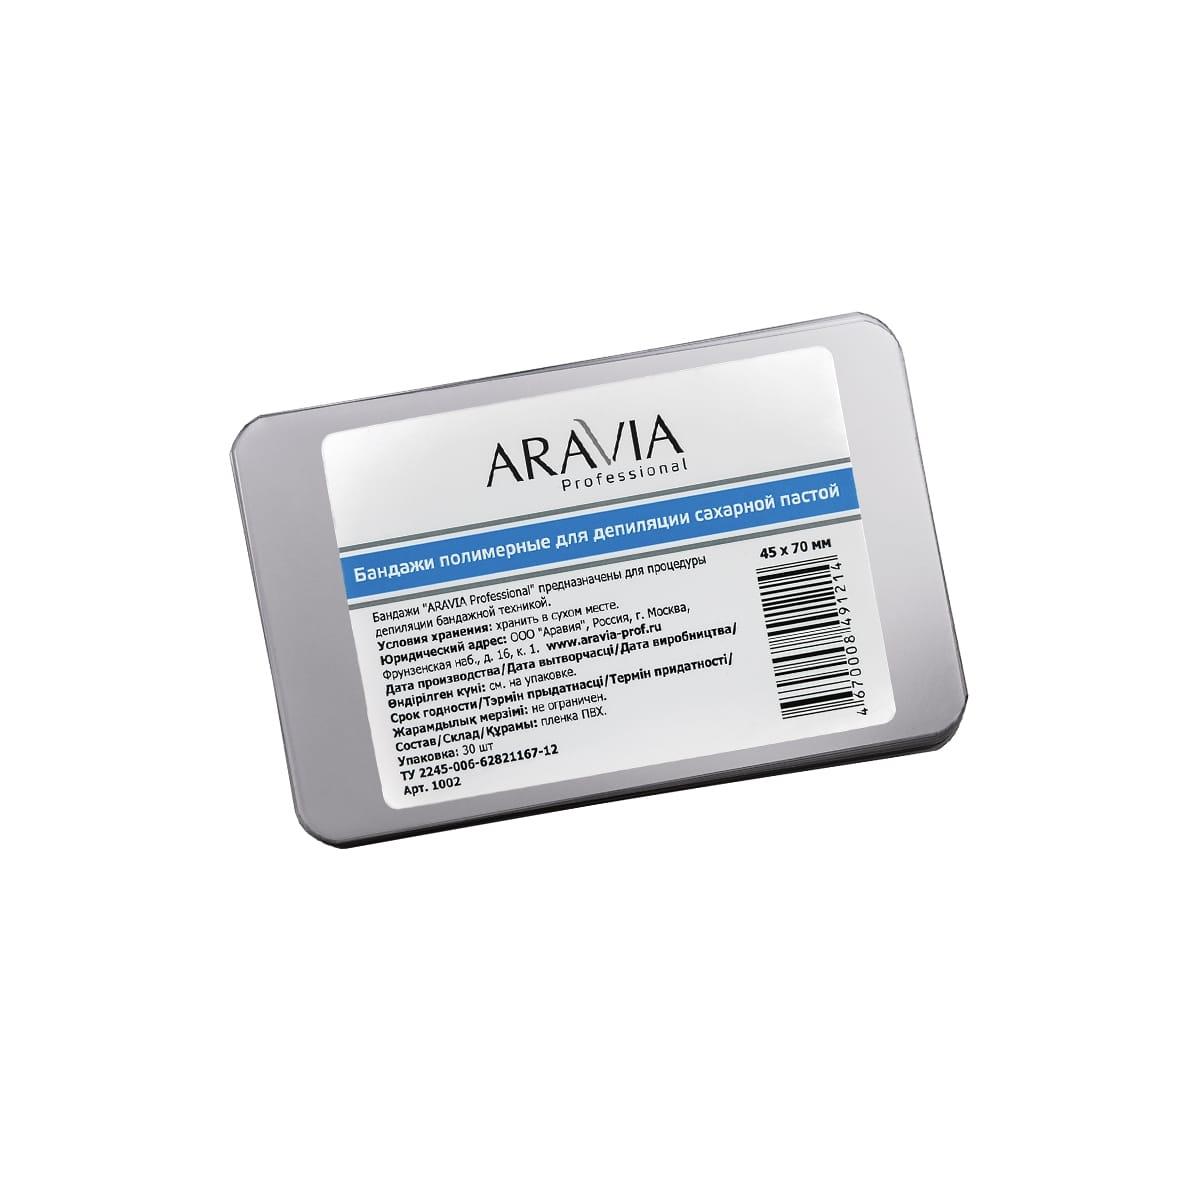 ARAVIA Бандаж Aravia Professional для Процедуры Шугаринга, 45х70 мм